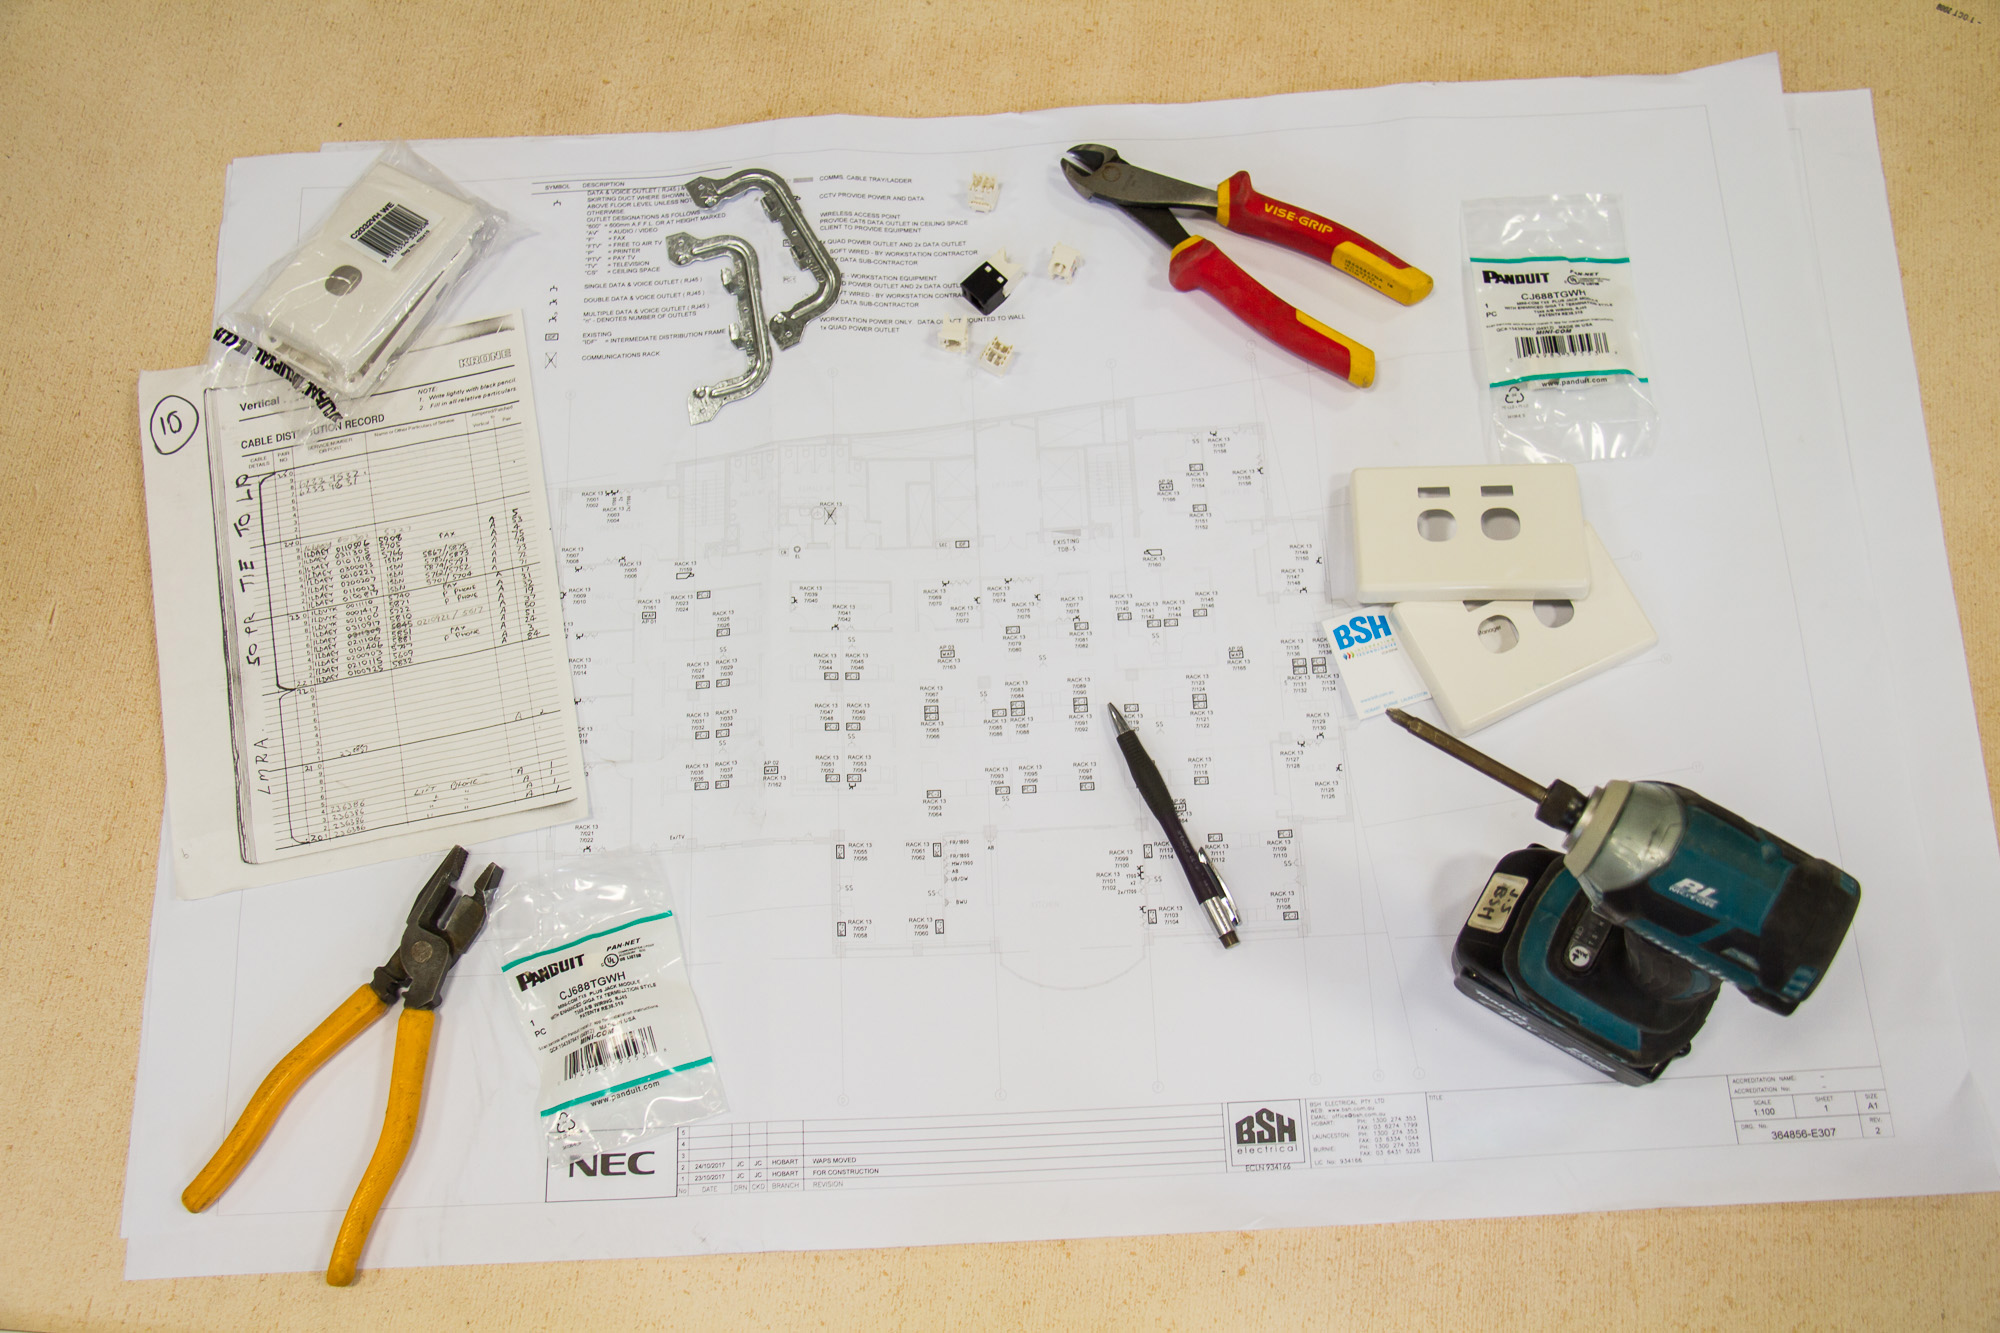 Bsh Tasmanian Electrical Contractors Tas Nurse Kit Wide Range Of Services